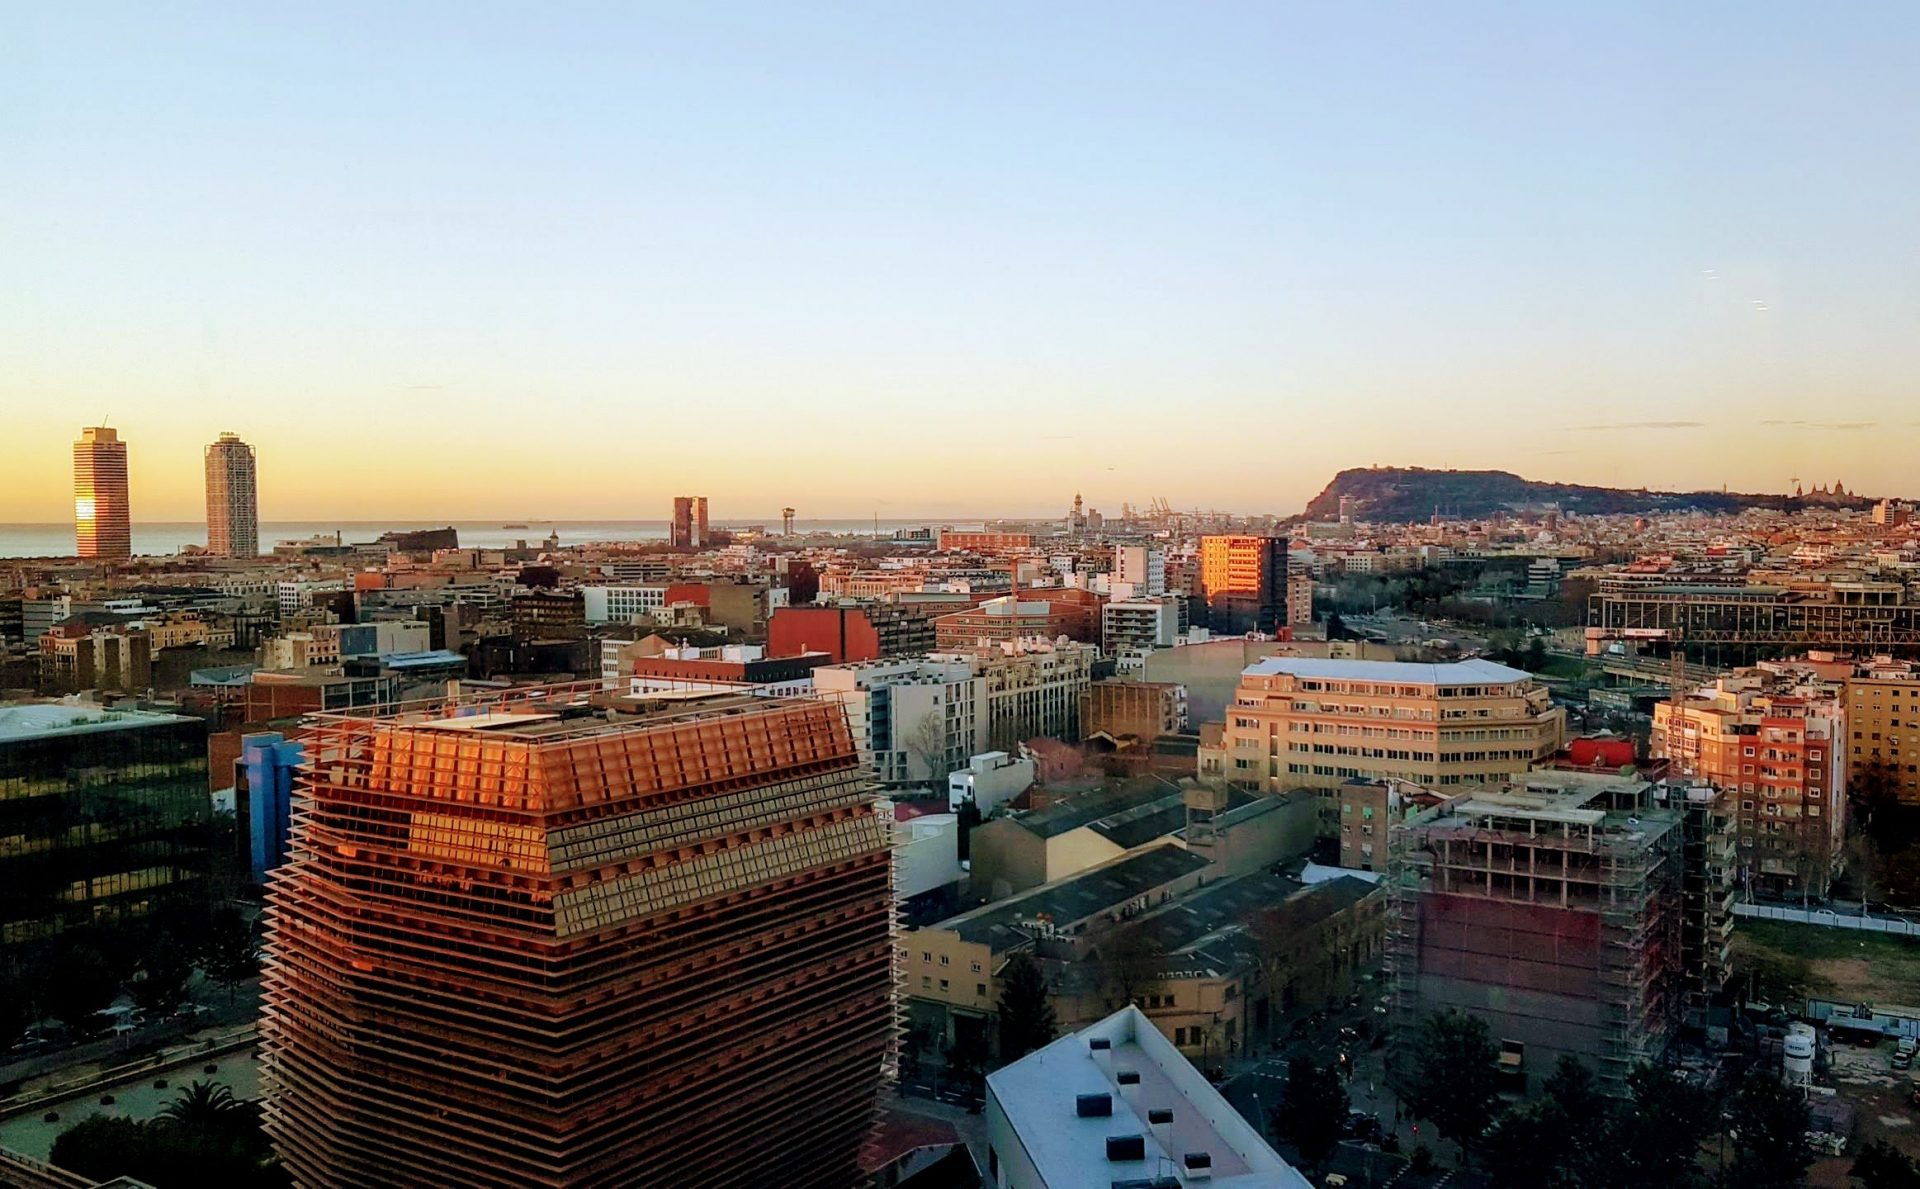 Вид на город, Барселона, Испания, Январь, 2018